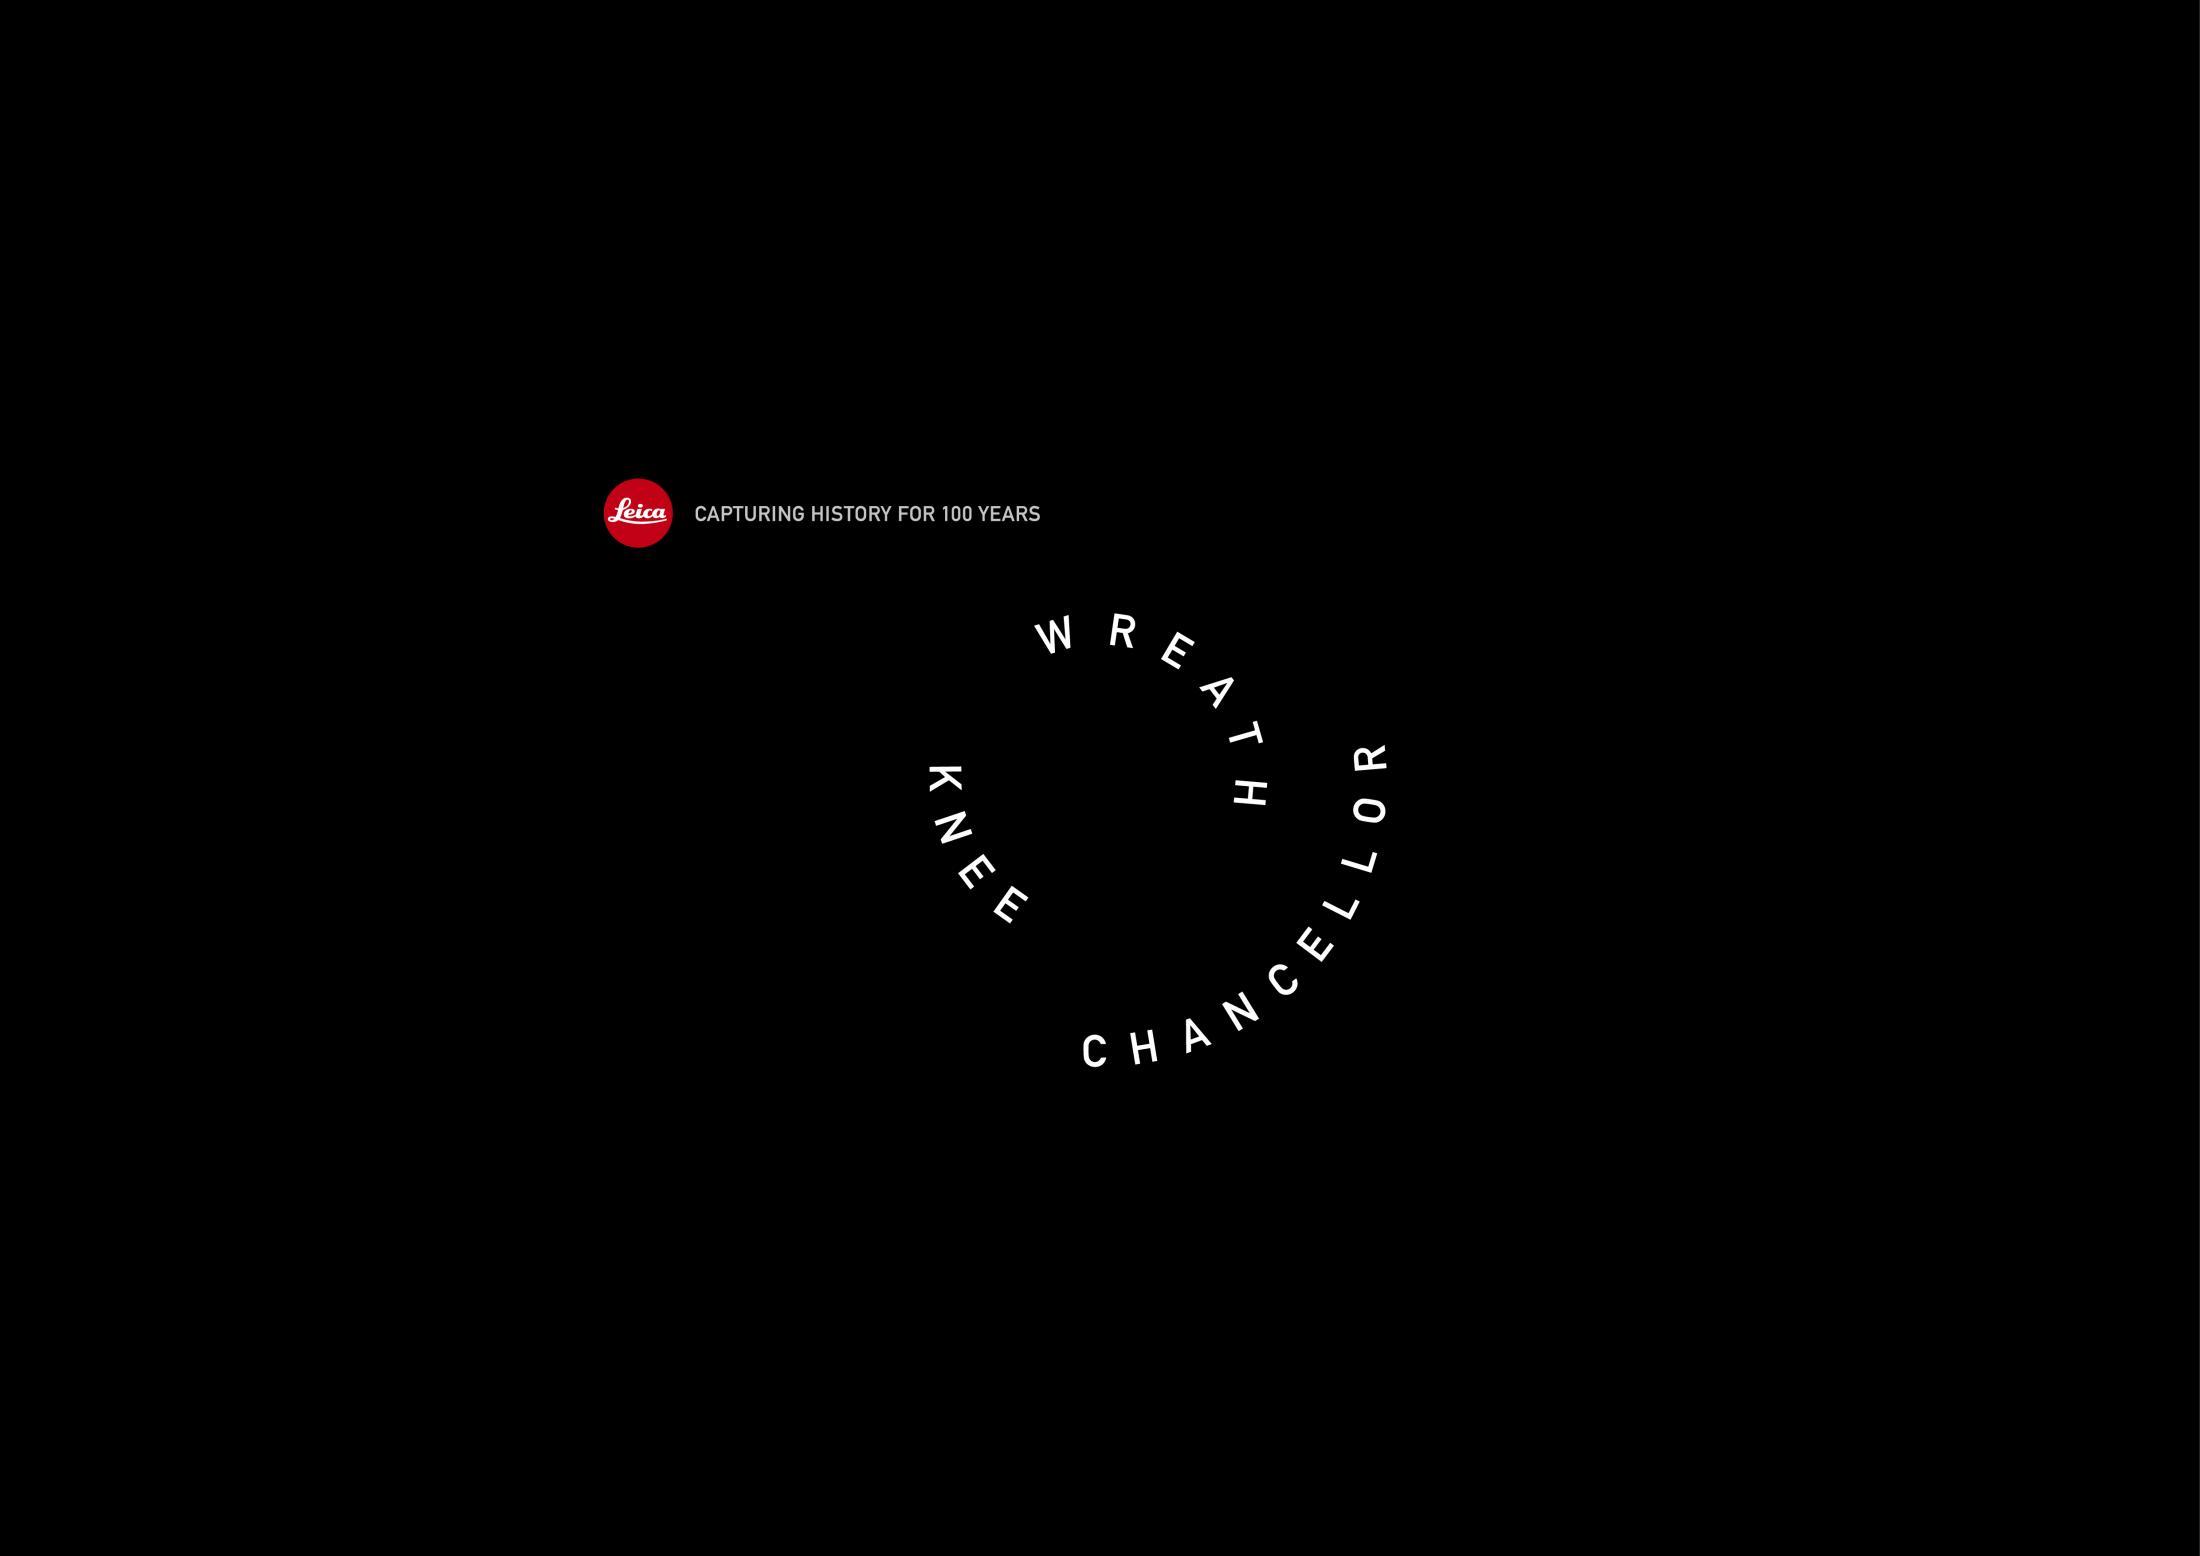 Thumbnail for Chancellor/Knee/Wreath